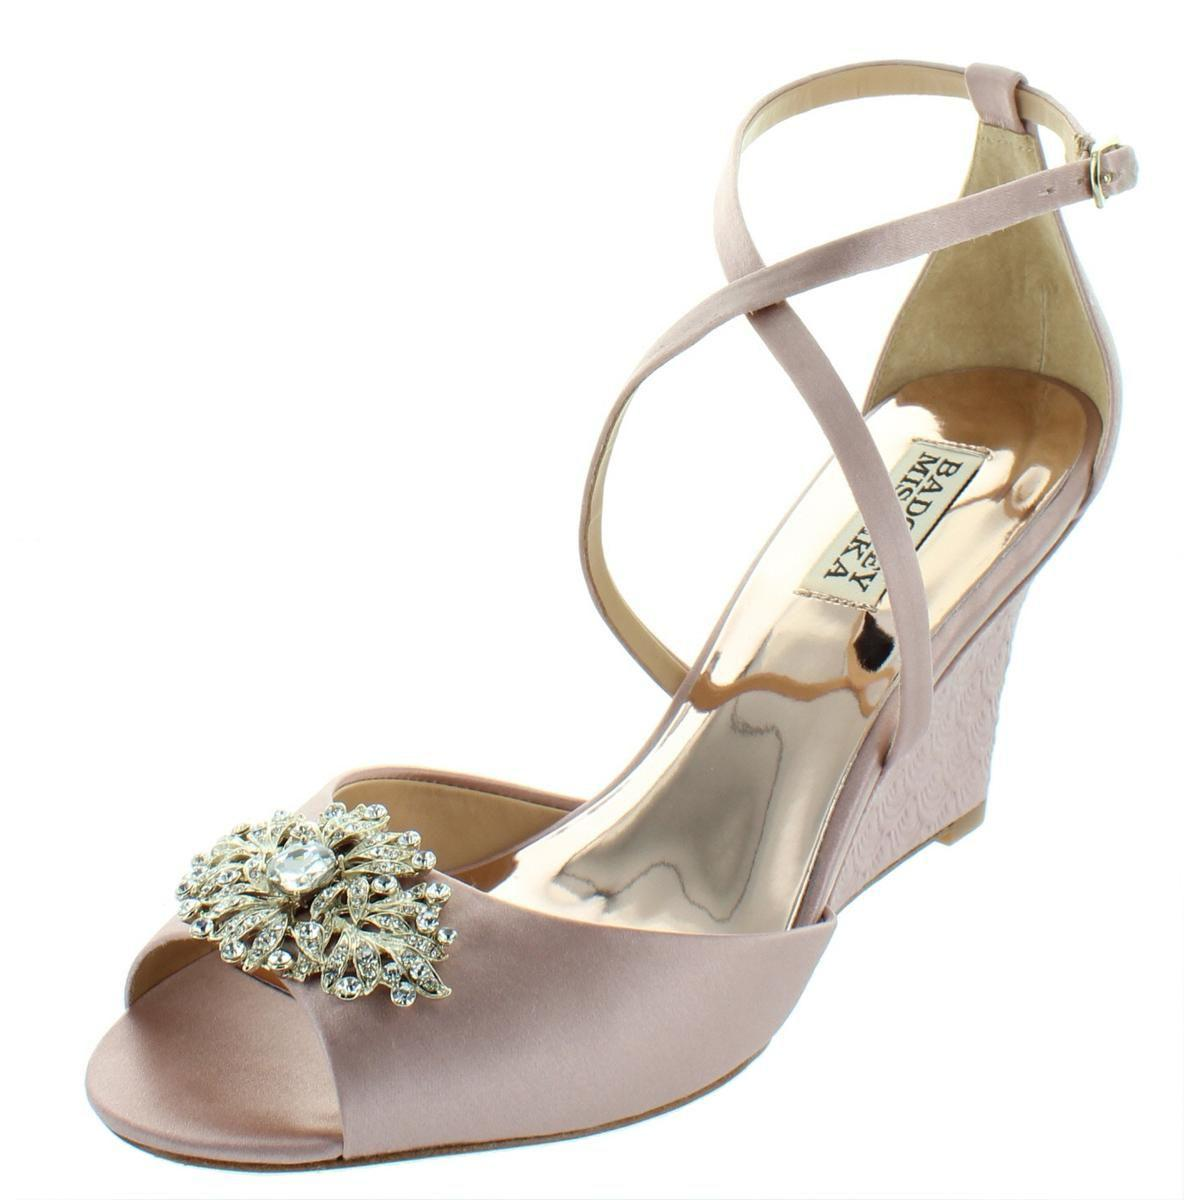 a802b99fd18 Lyst - Badgley Mischka Womens Abigail Satin Embellished Wedge Sandals